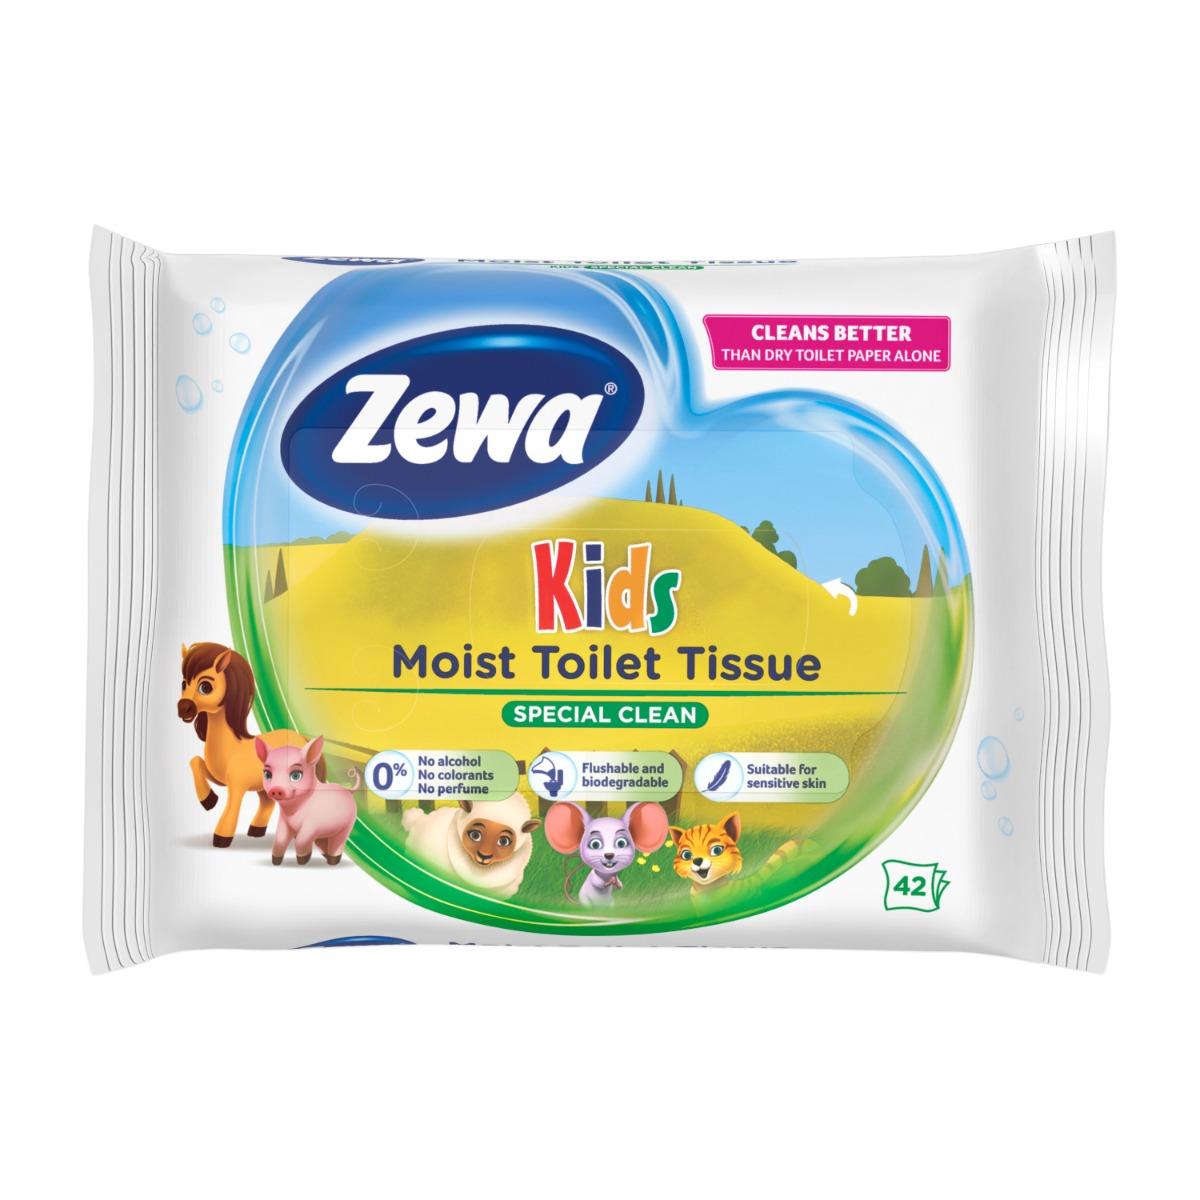 Hartie igienica umeda Zewa Kids, 42 bucati imagine